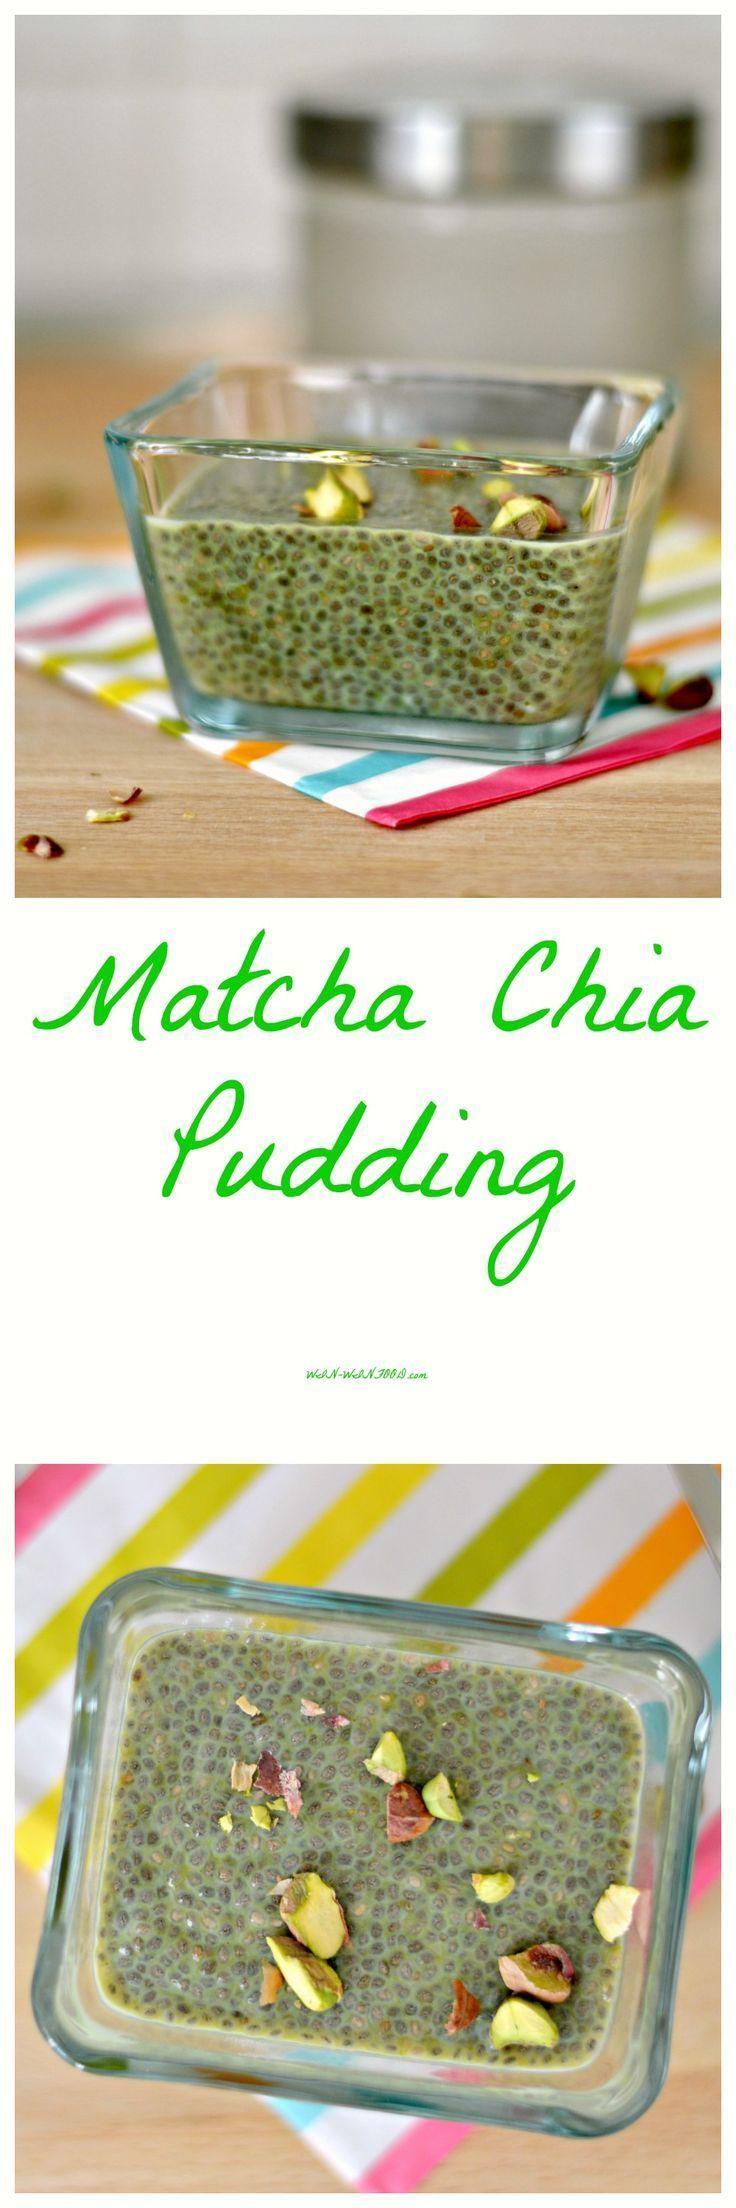 Matcha Chia Pudding   WIN-WINFOOD.com Energy boosting matcha chia pudding is…